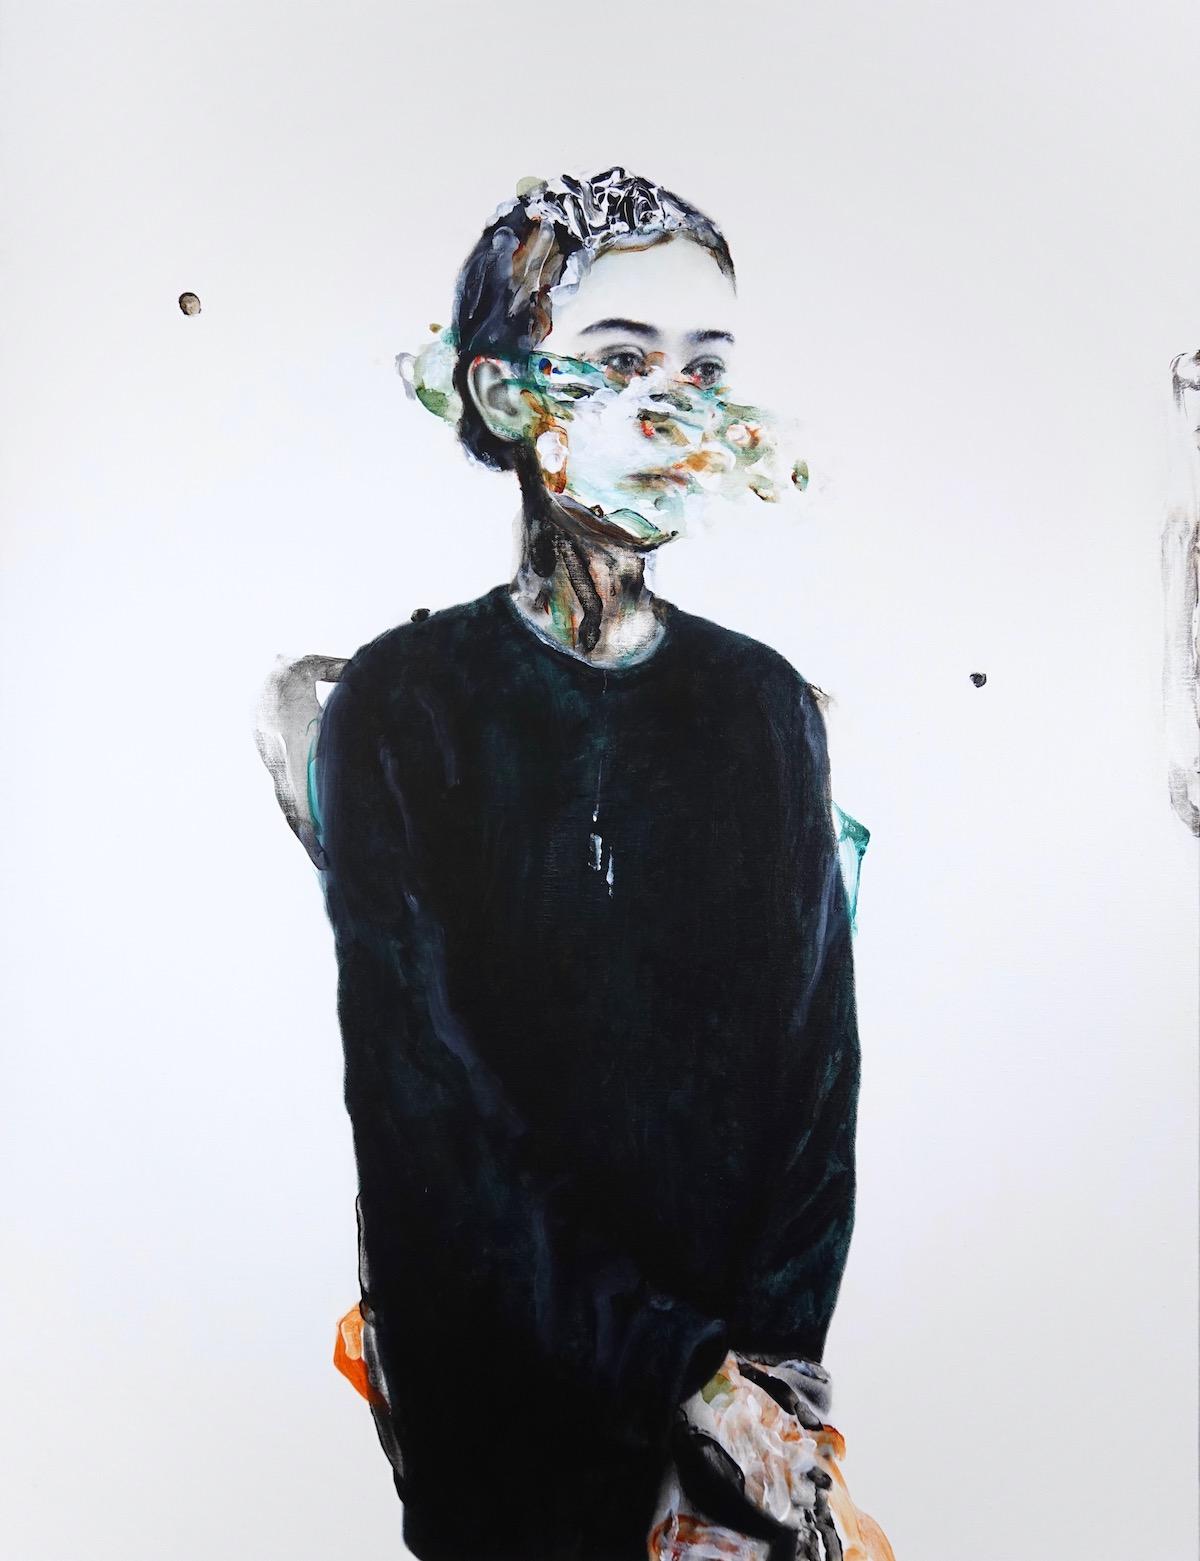 antoine cordet canvas toile peinture painting portrait art artist artiste peintre acrylic oil in rough seas